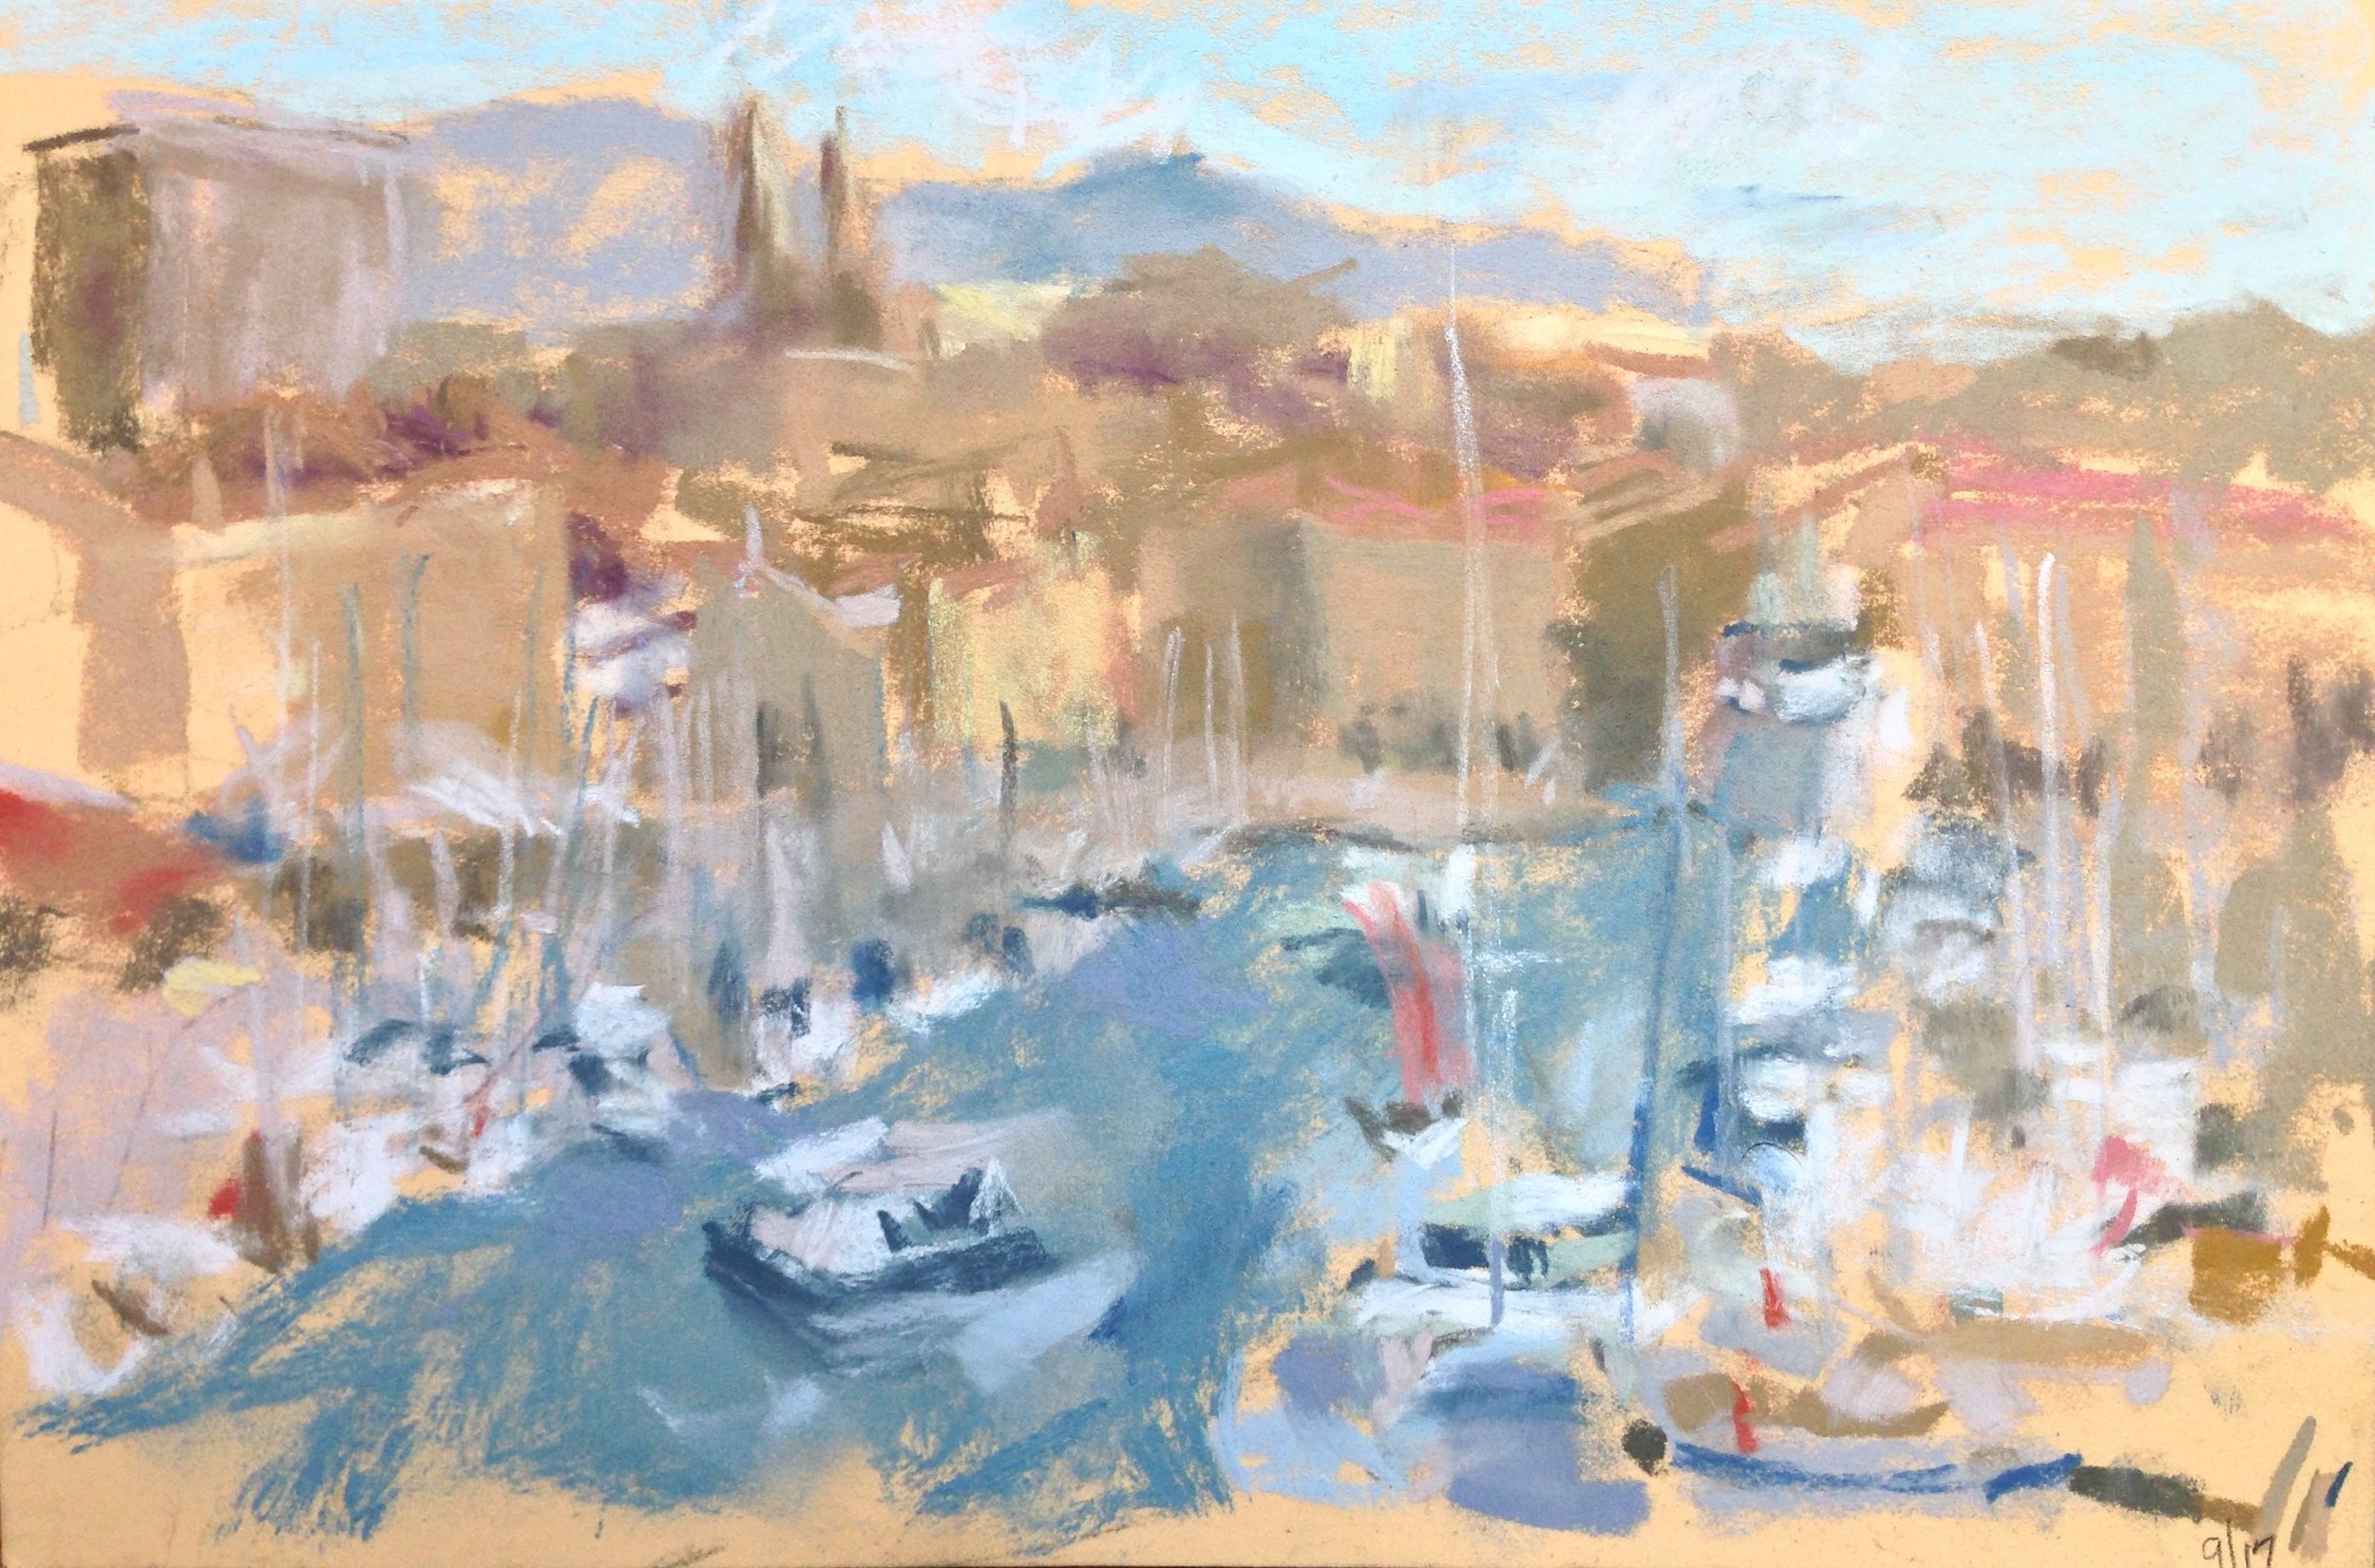 Marseille's Old Port